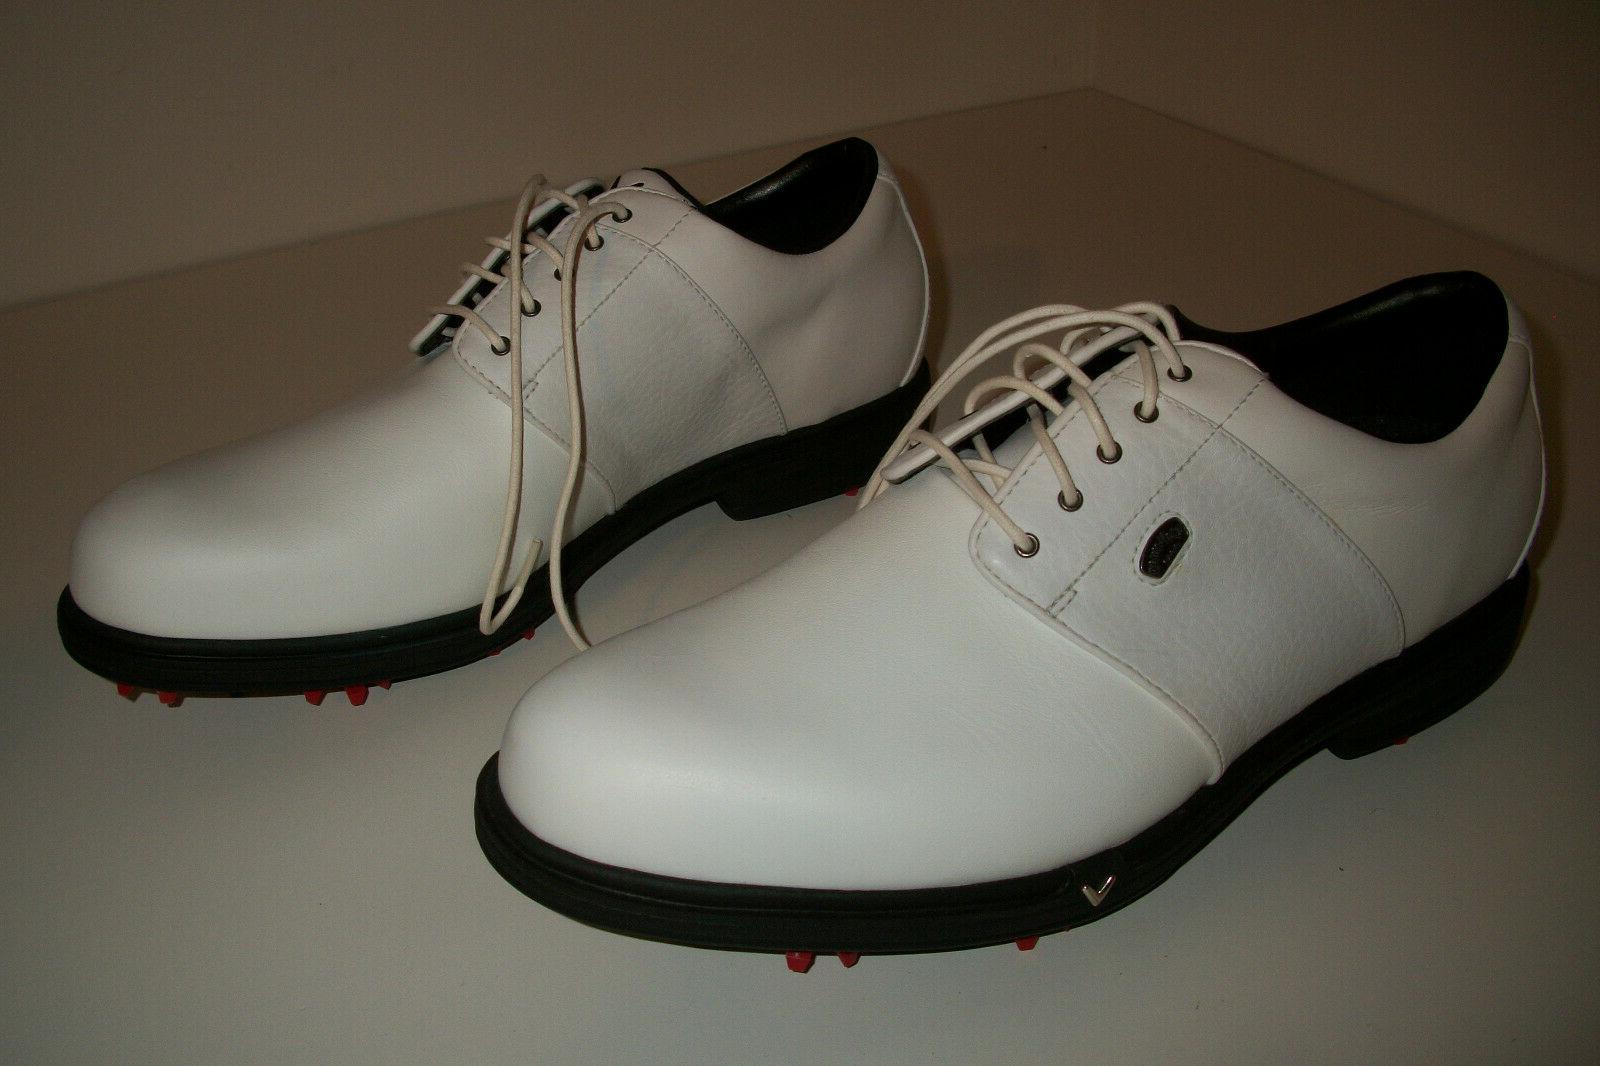 NEW Golf - - White - M212-01 - Tech